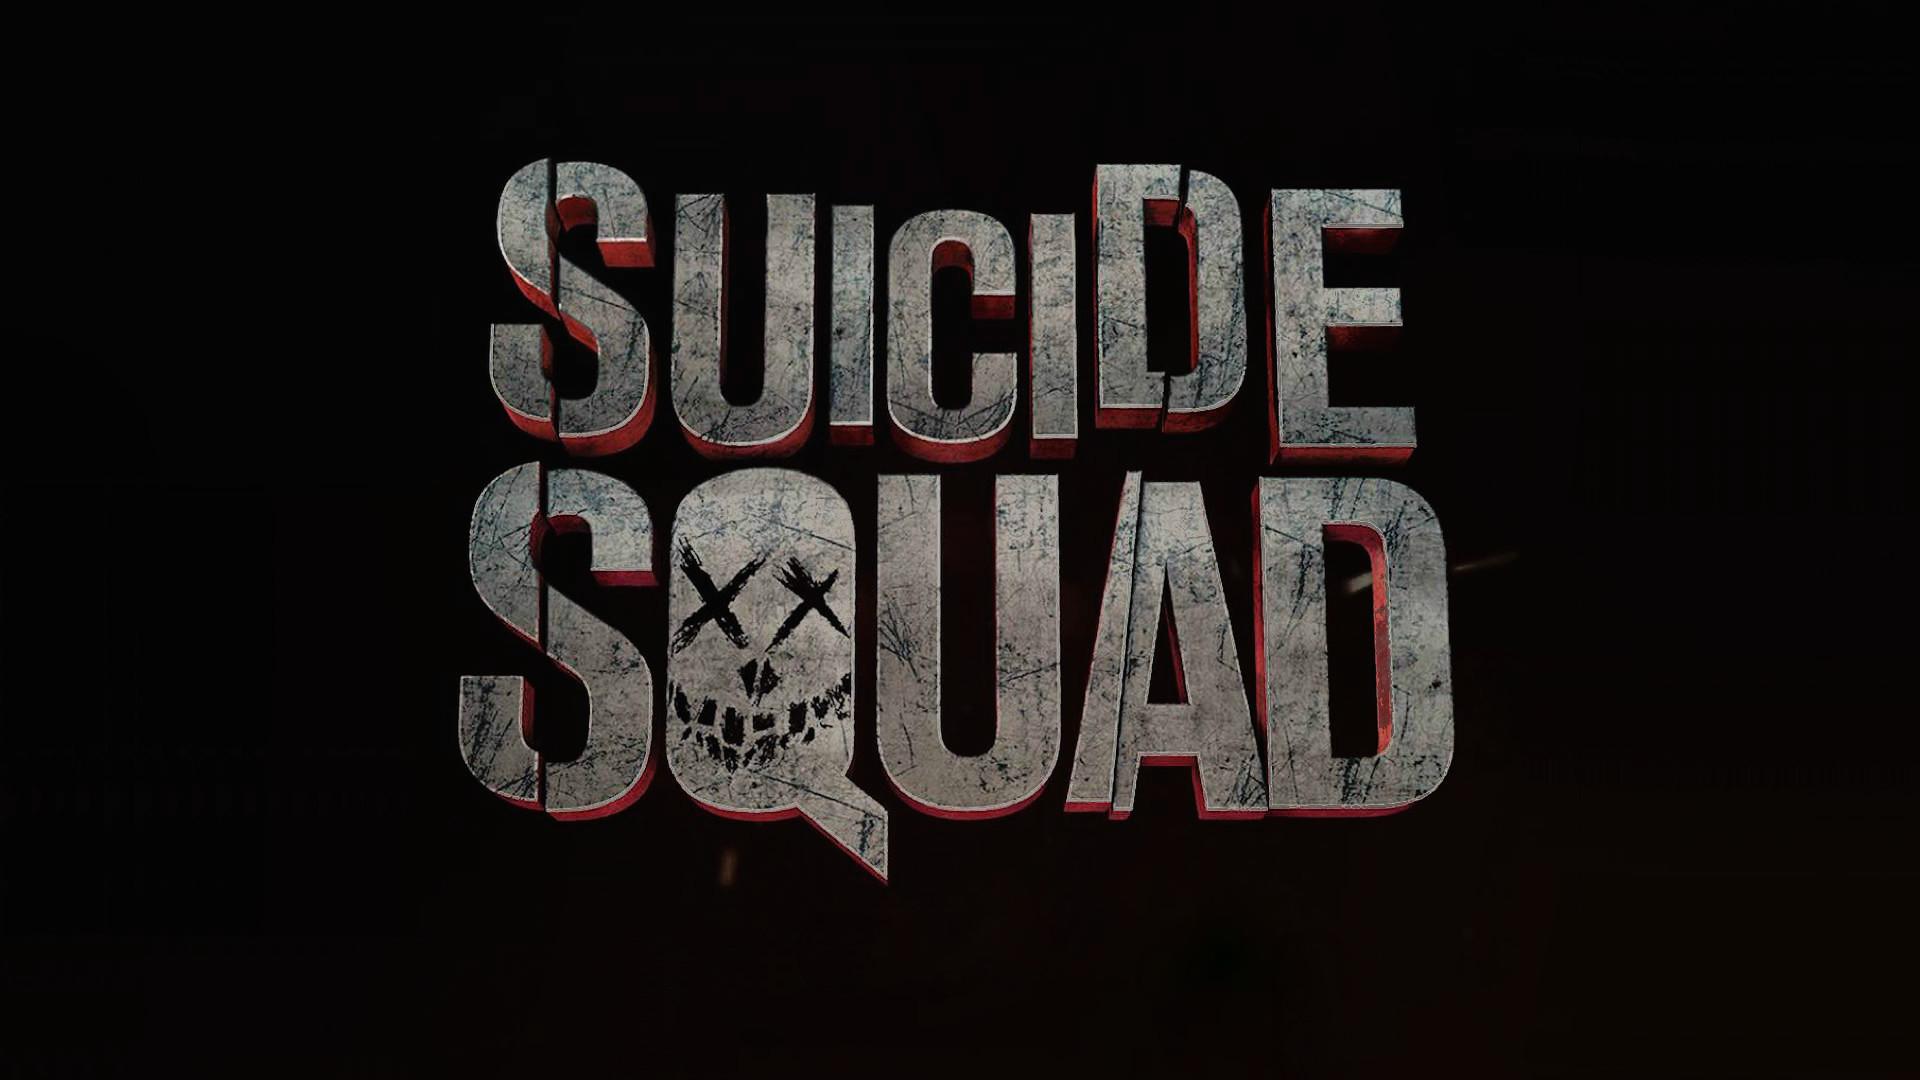 Suicide Squad 2016 Background